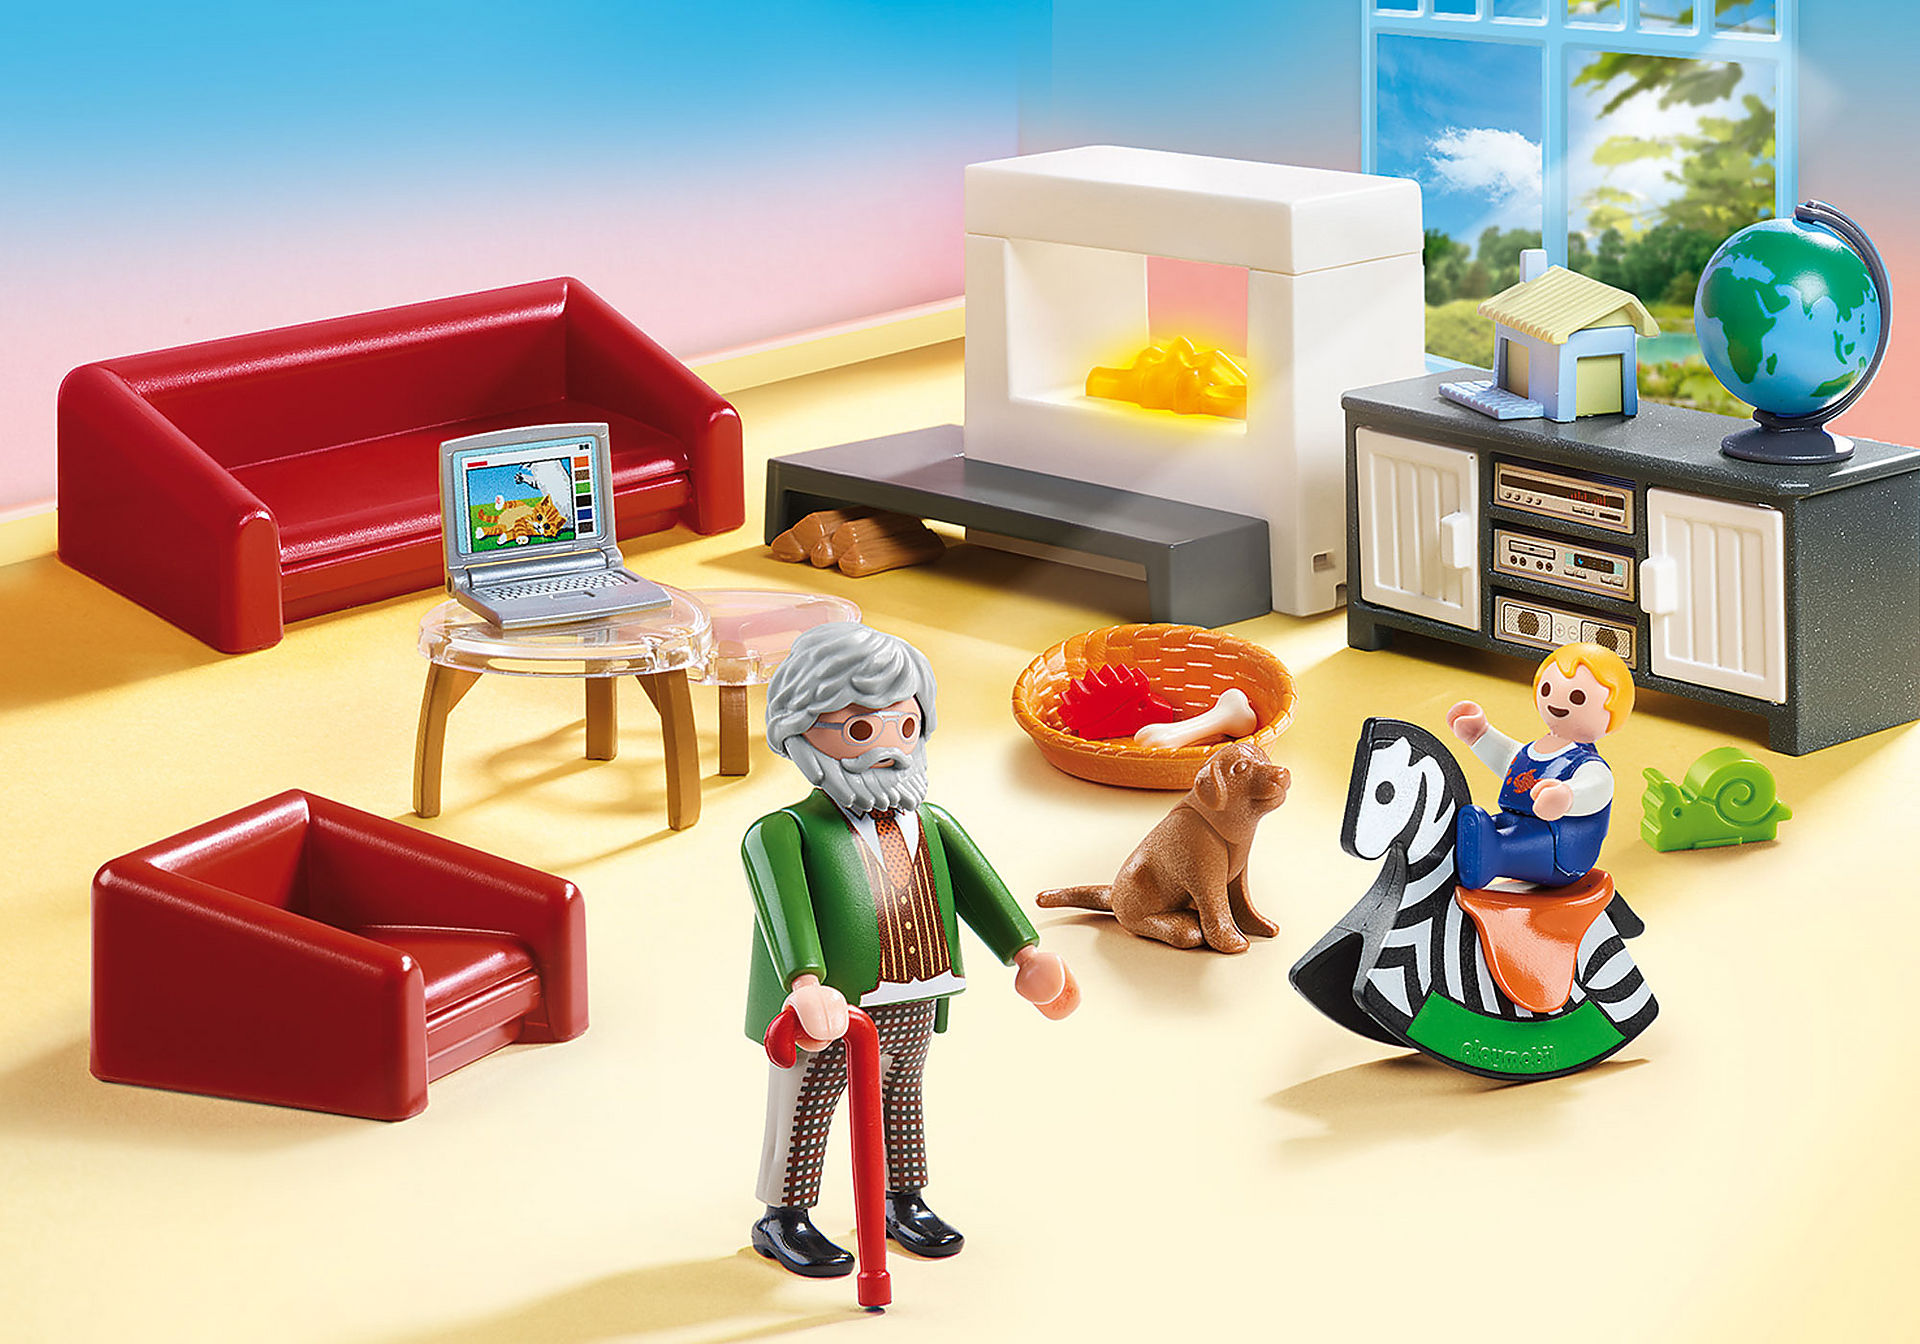 70207 Comfortable Living Room zoom image1